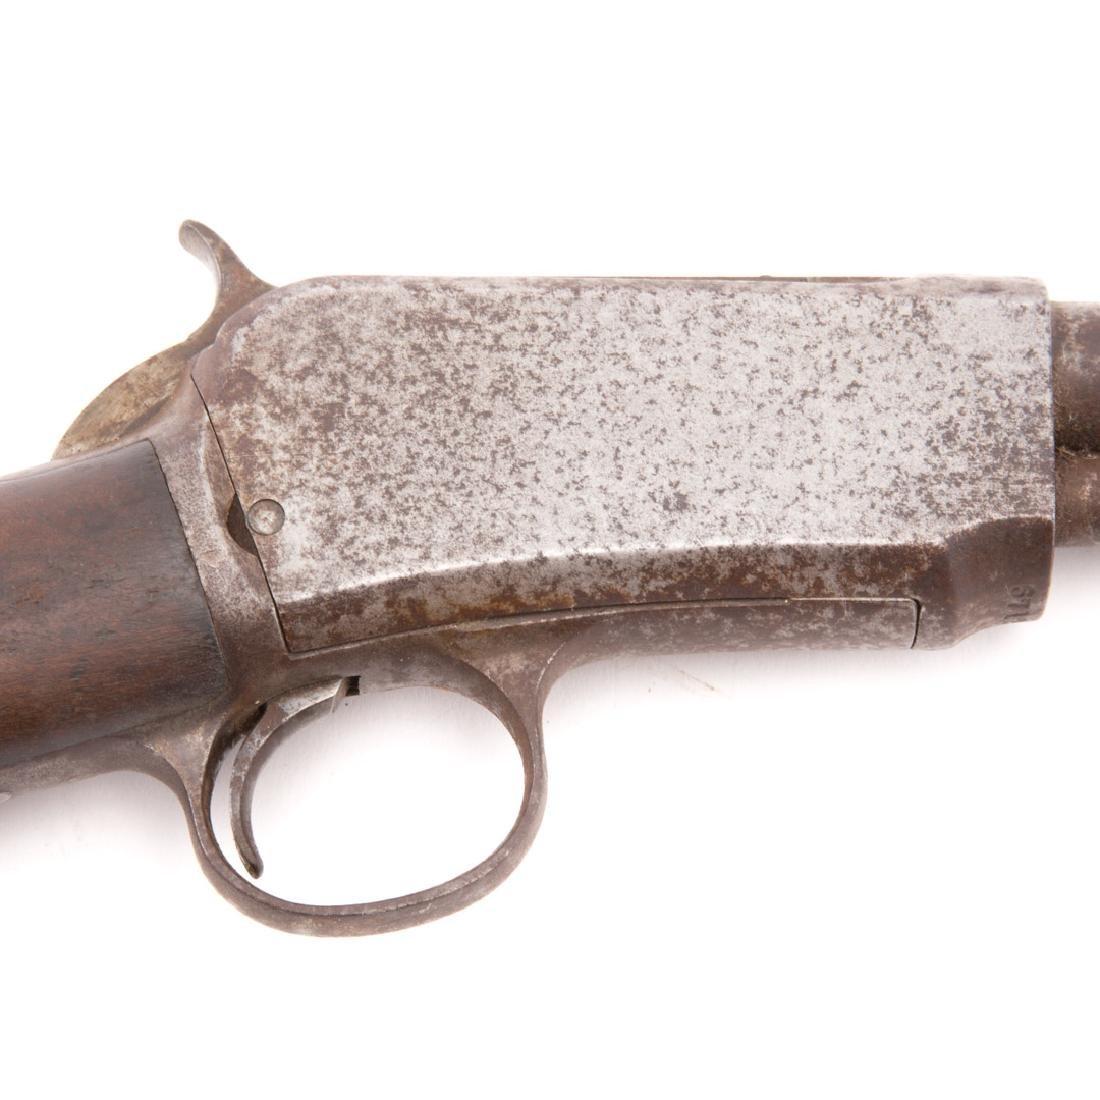 Winchester single shot 22 caliber - 3